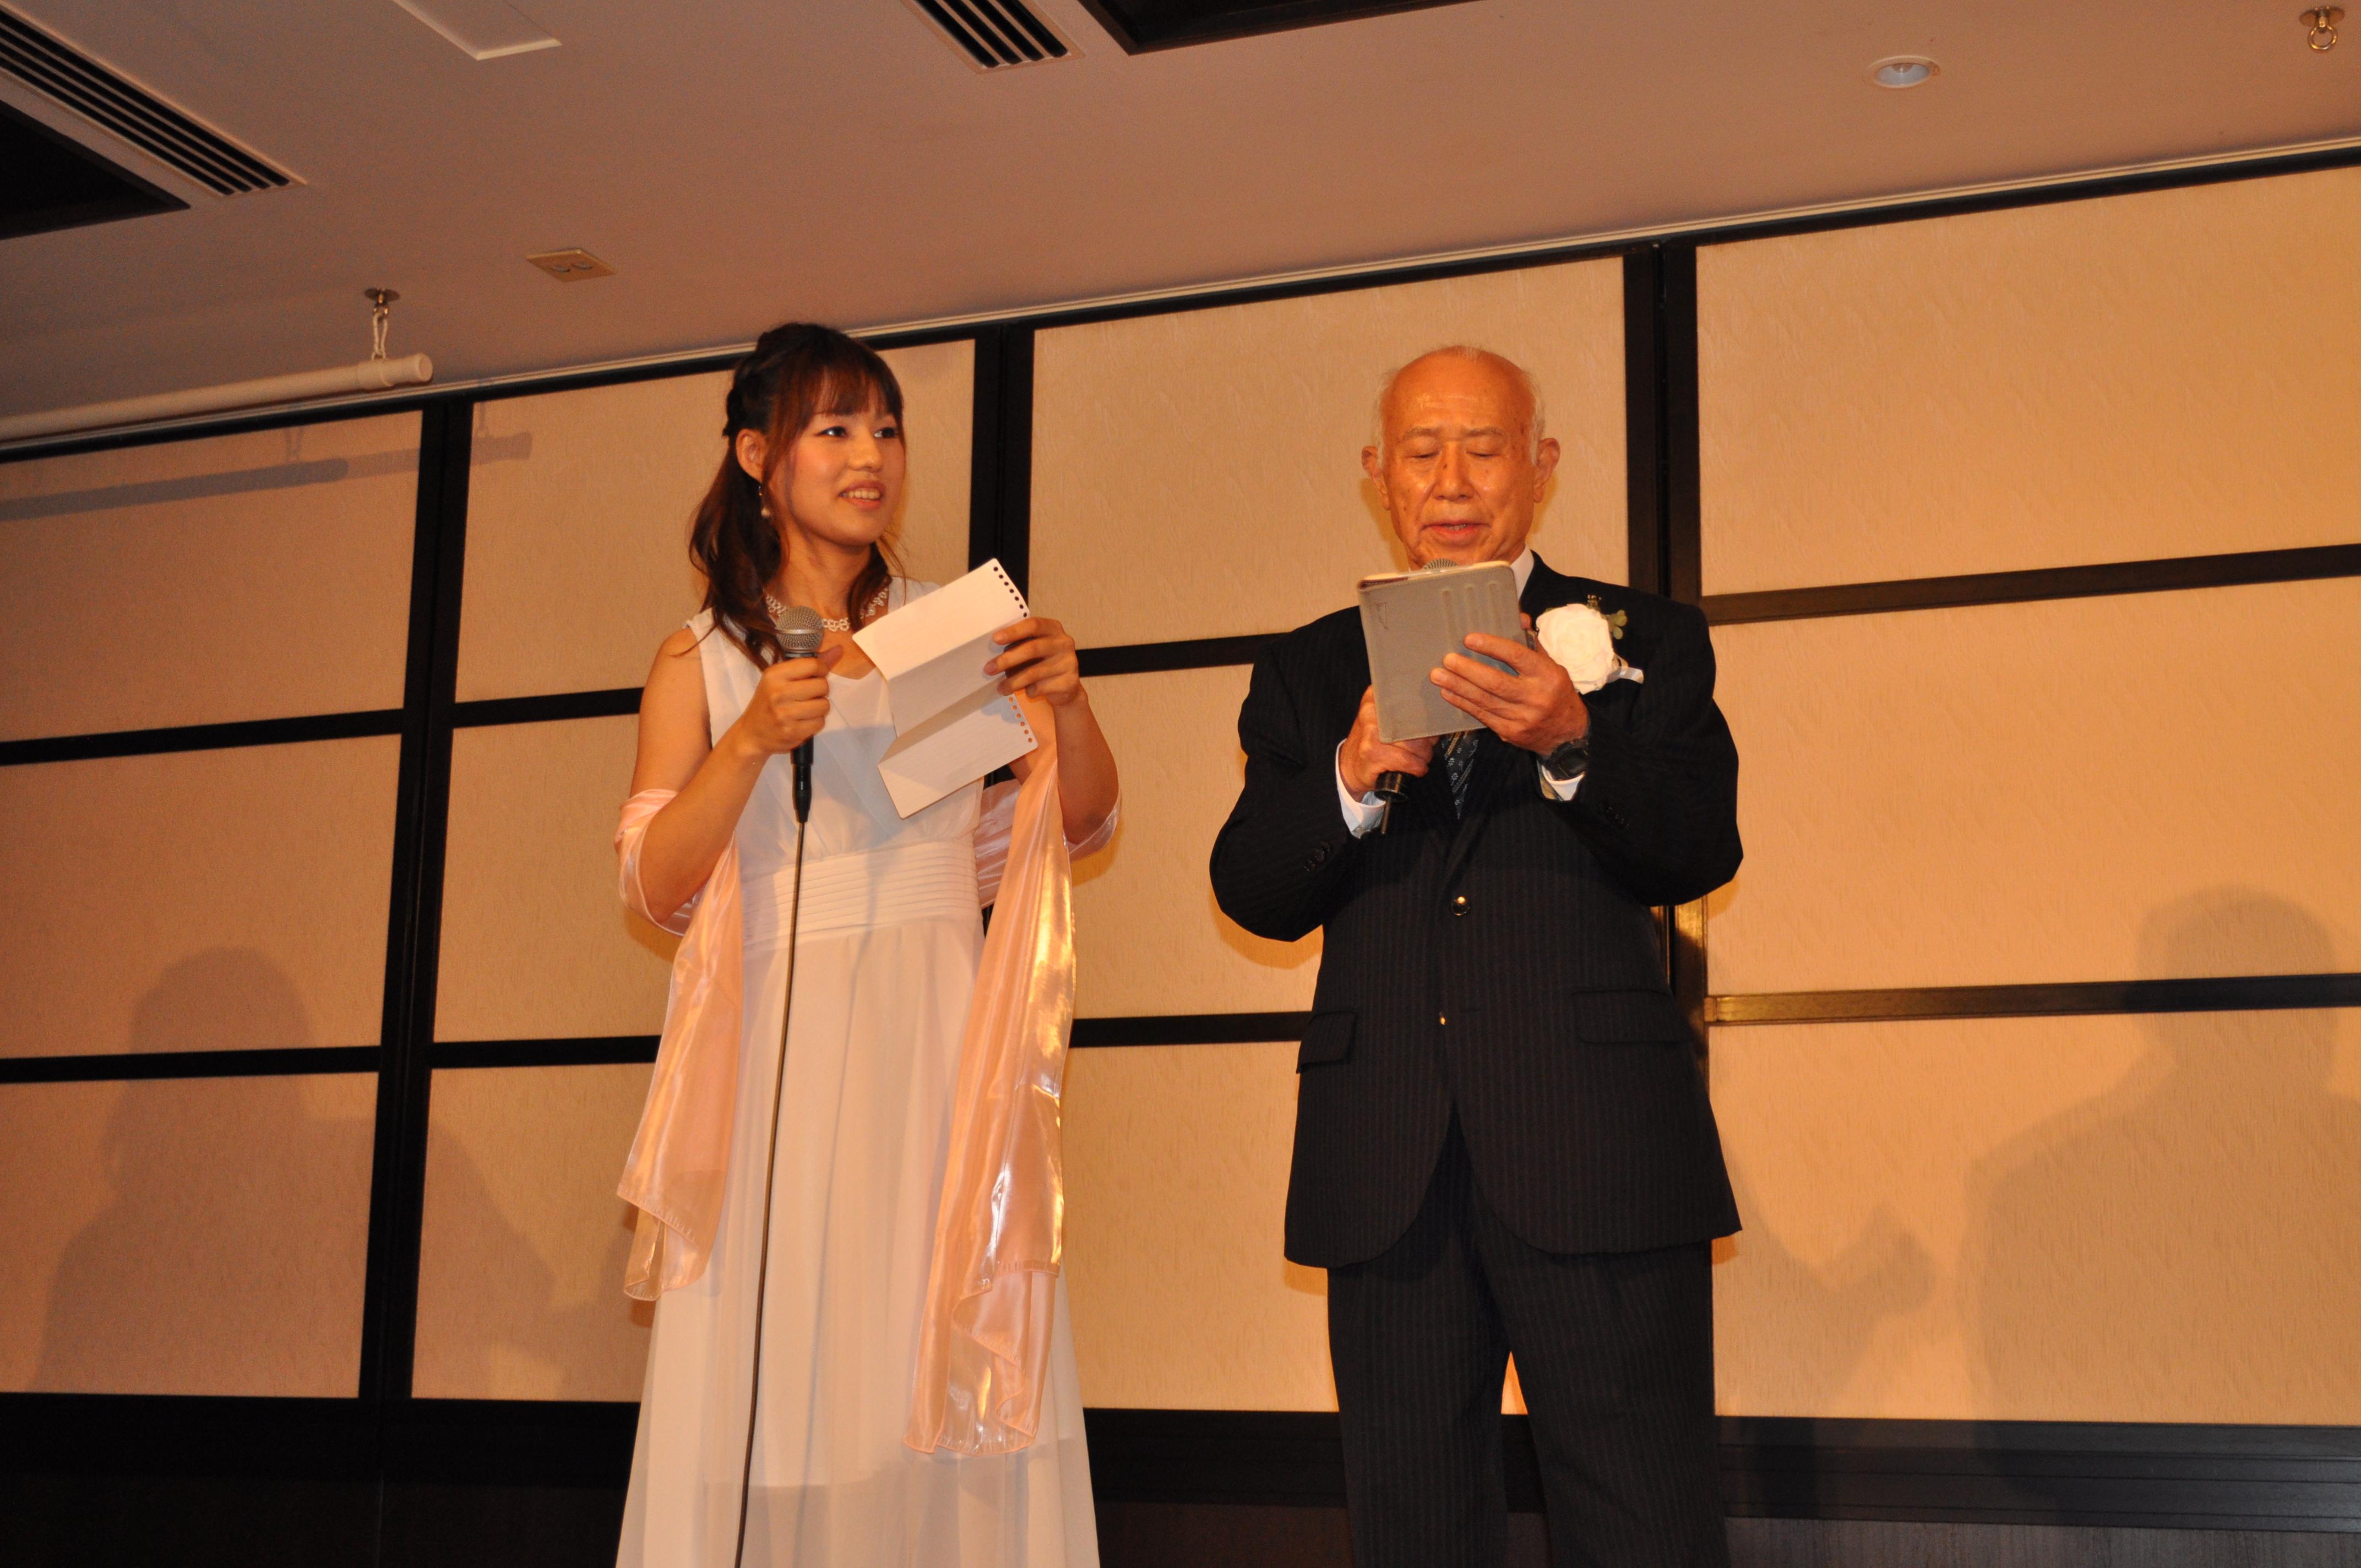 DSC 0506 - 第6回思風会全国大会2018in東京開催